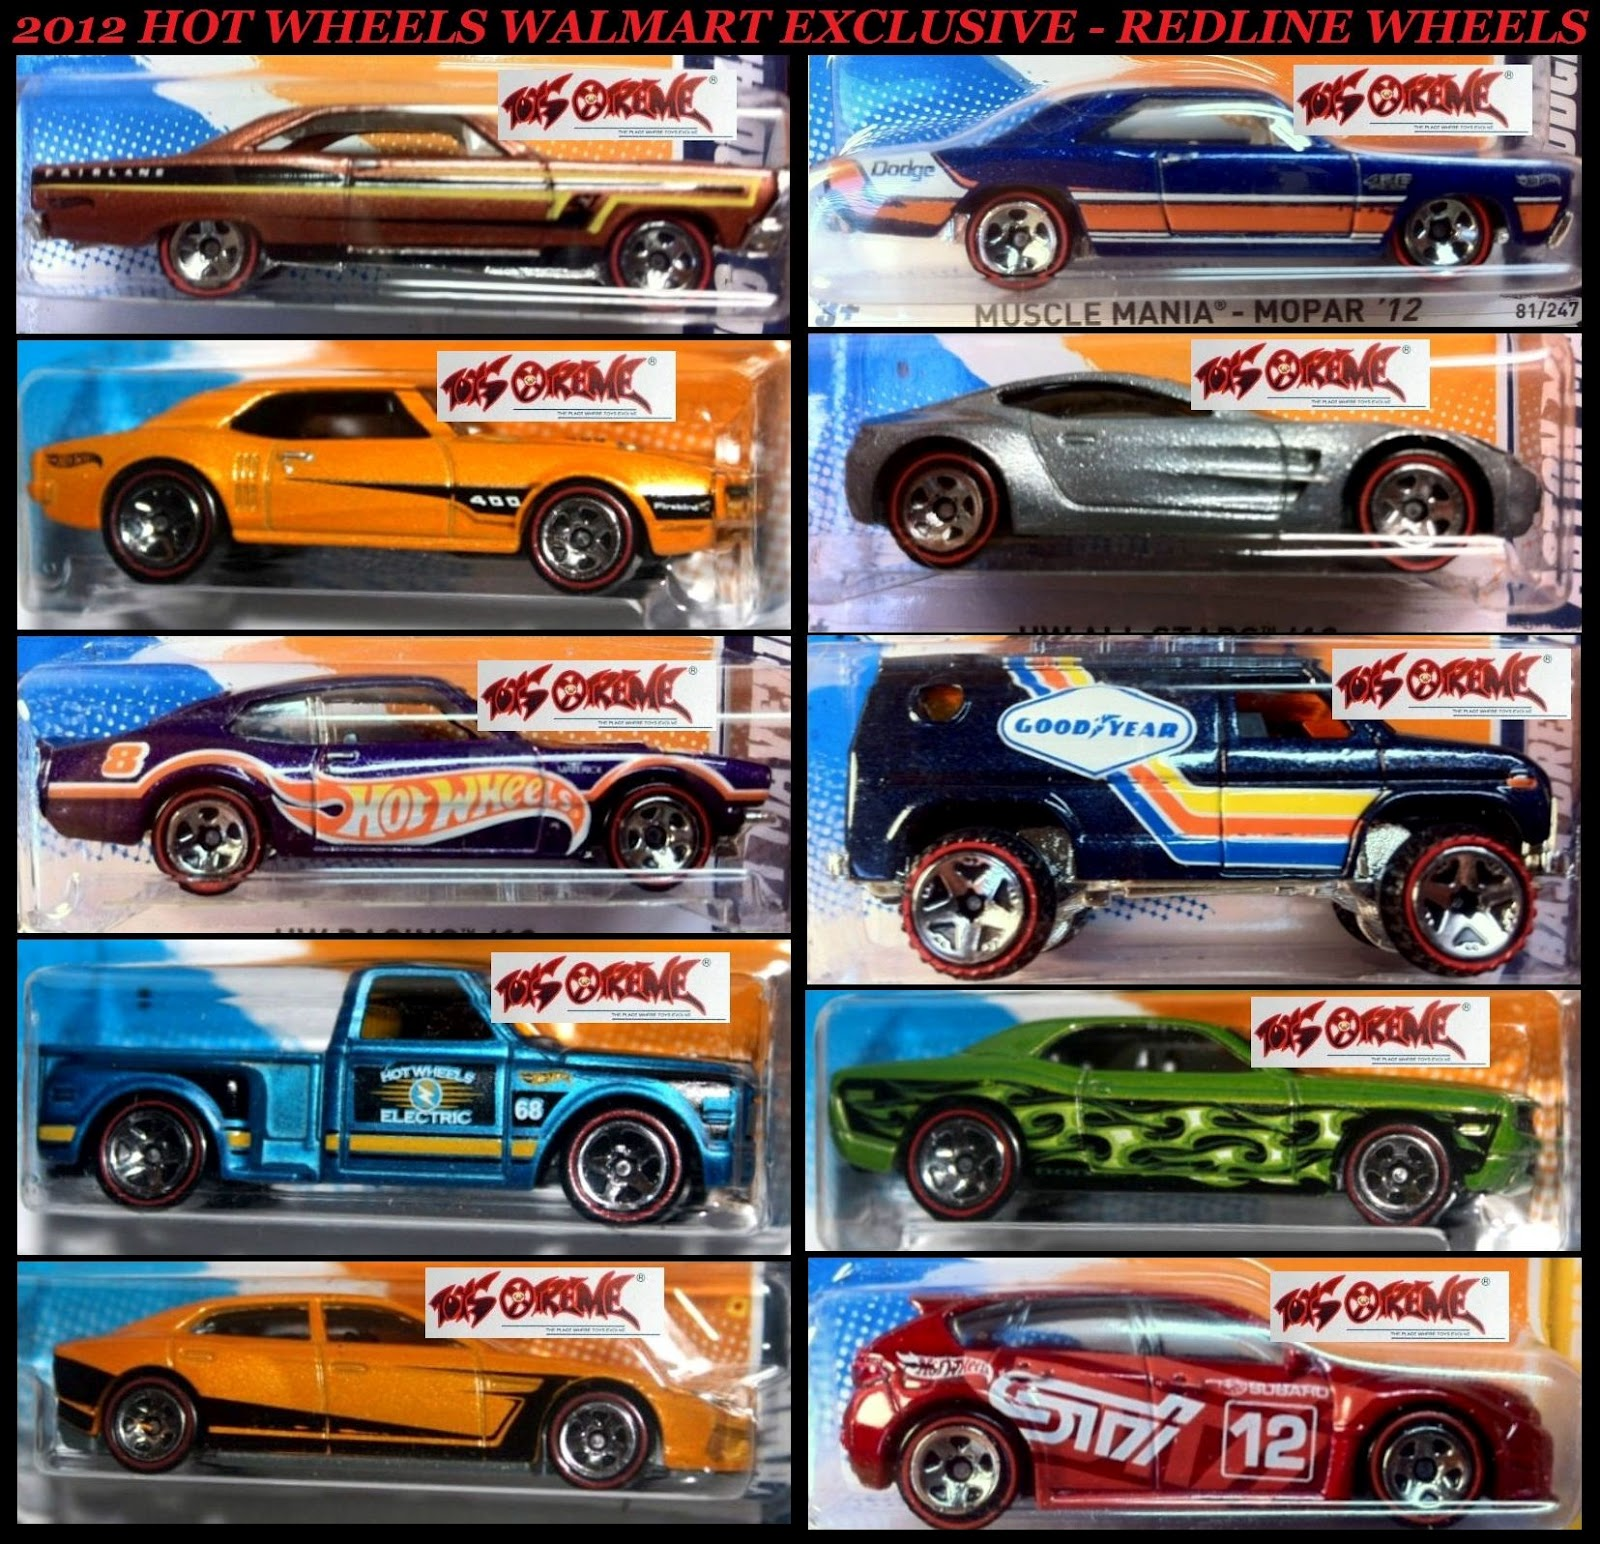 kelvinator21s hot wheels - Hot Wheels Cars 2012